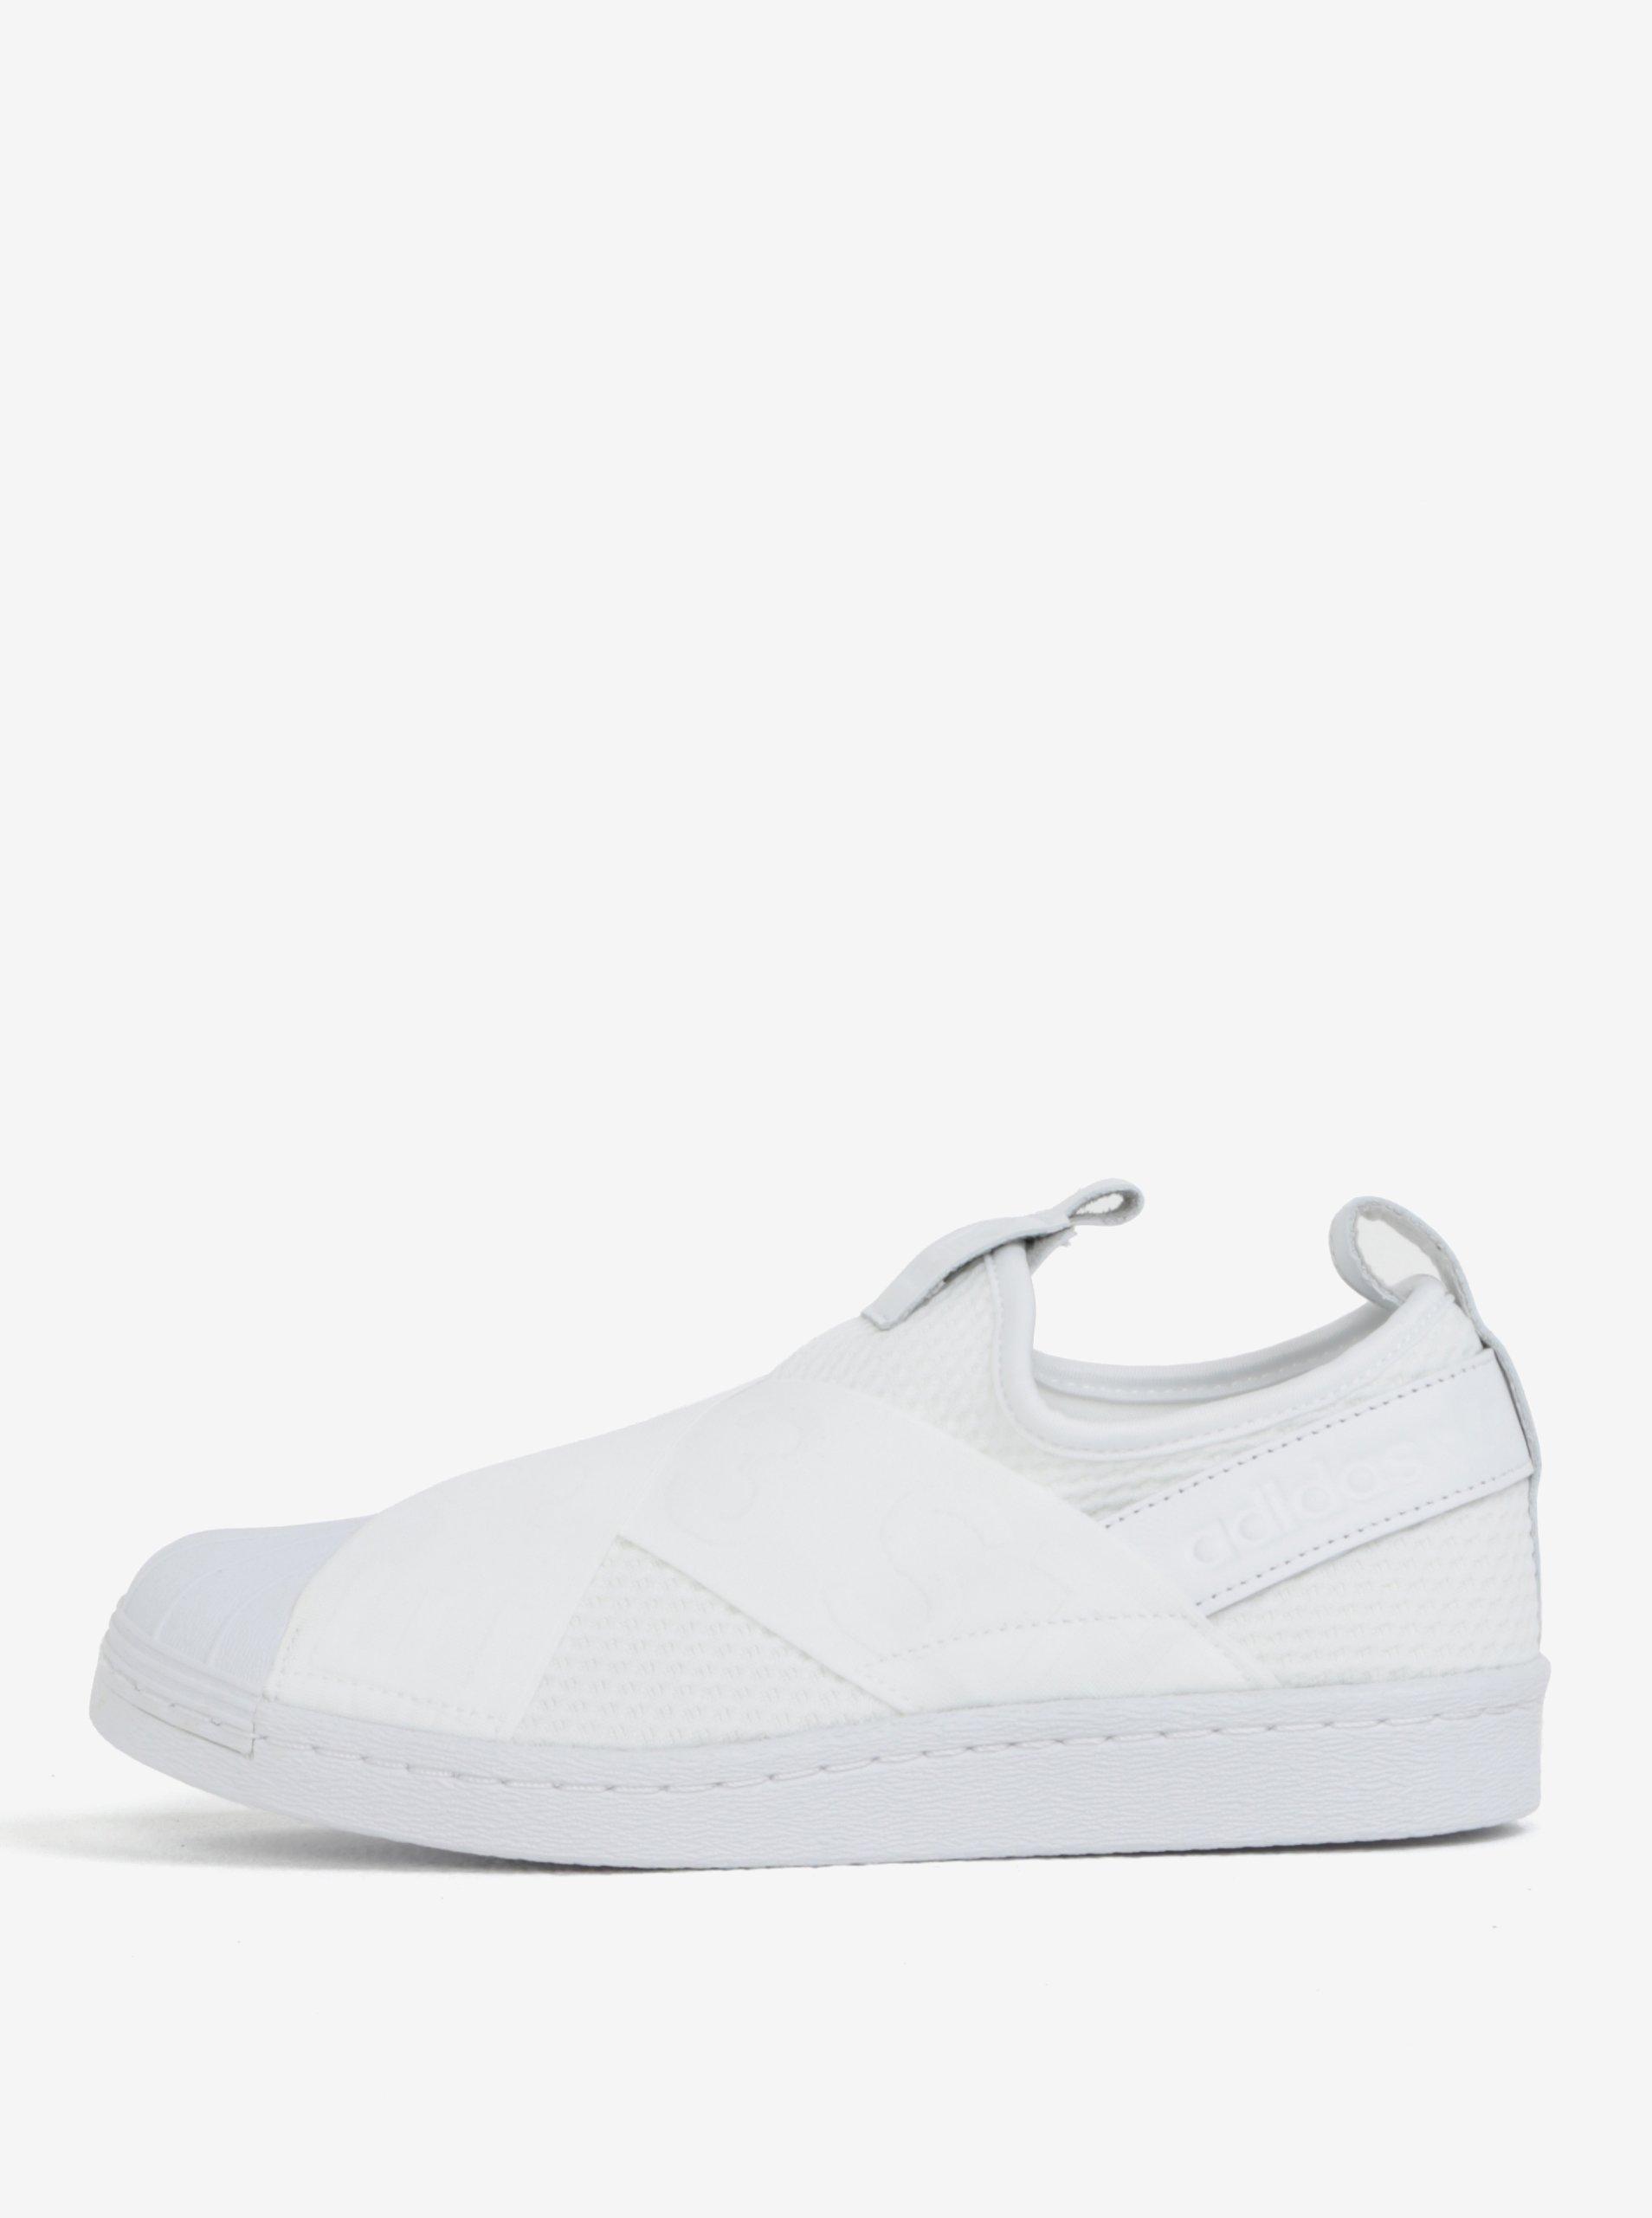 f4d6c15bc83d1 Biele dámske slip on s koženými detailmi adidas Originals Superstar ...